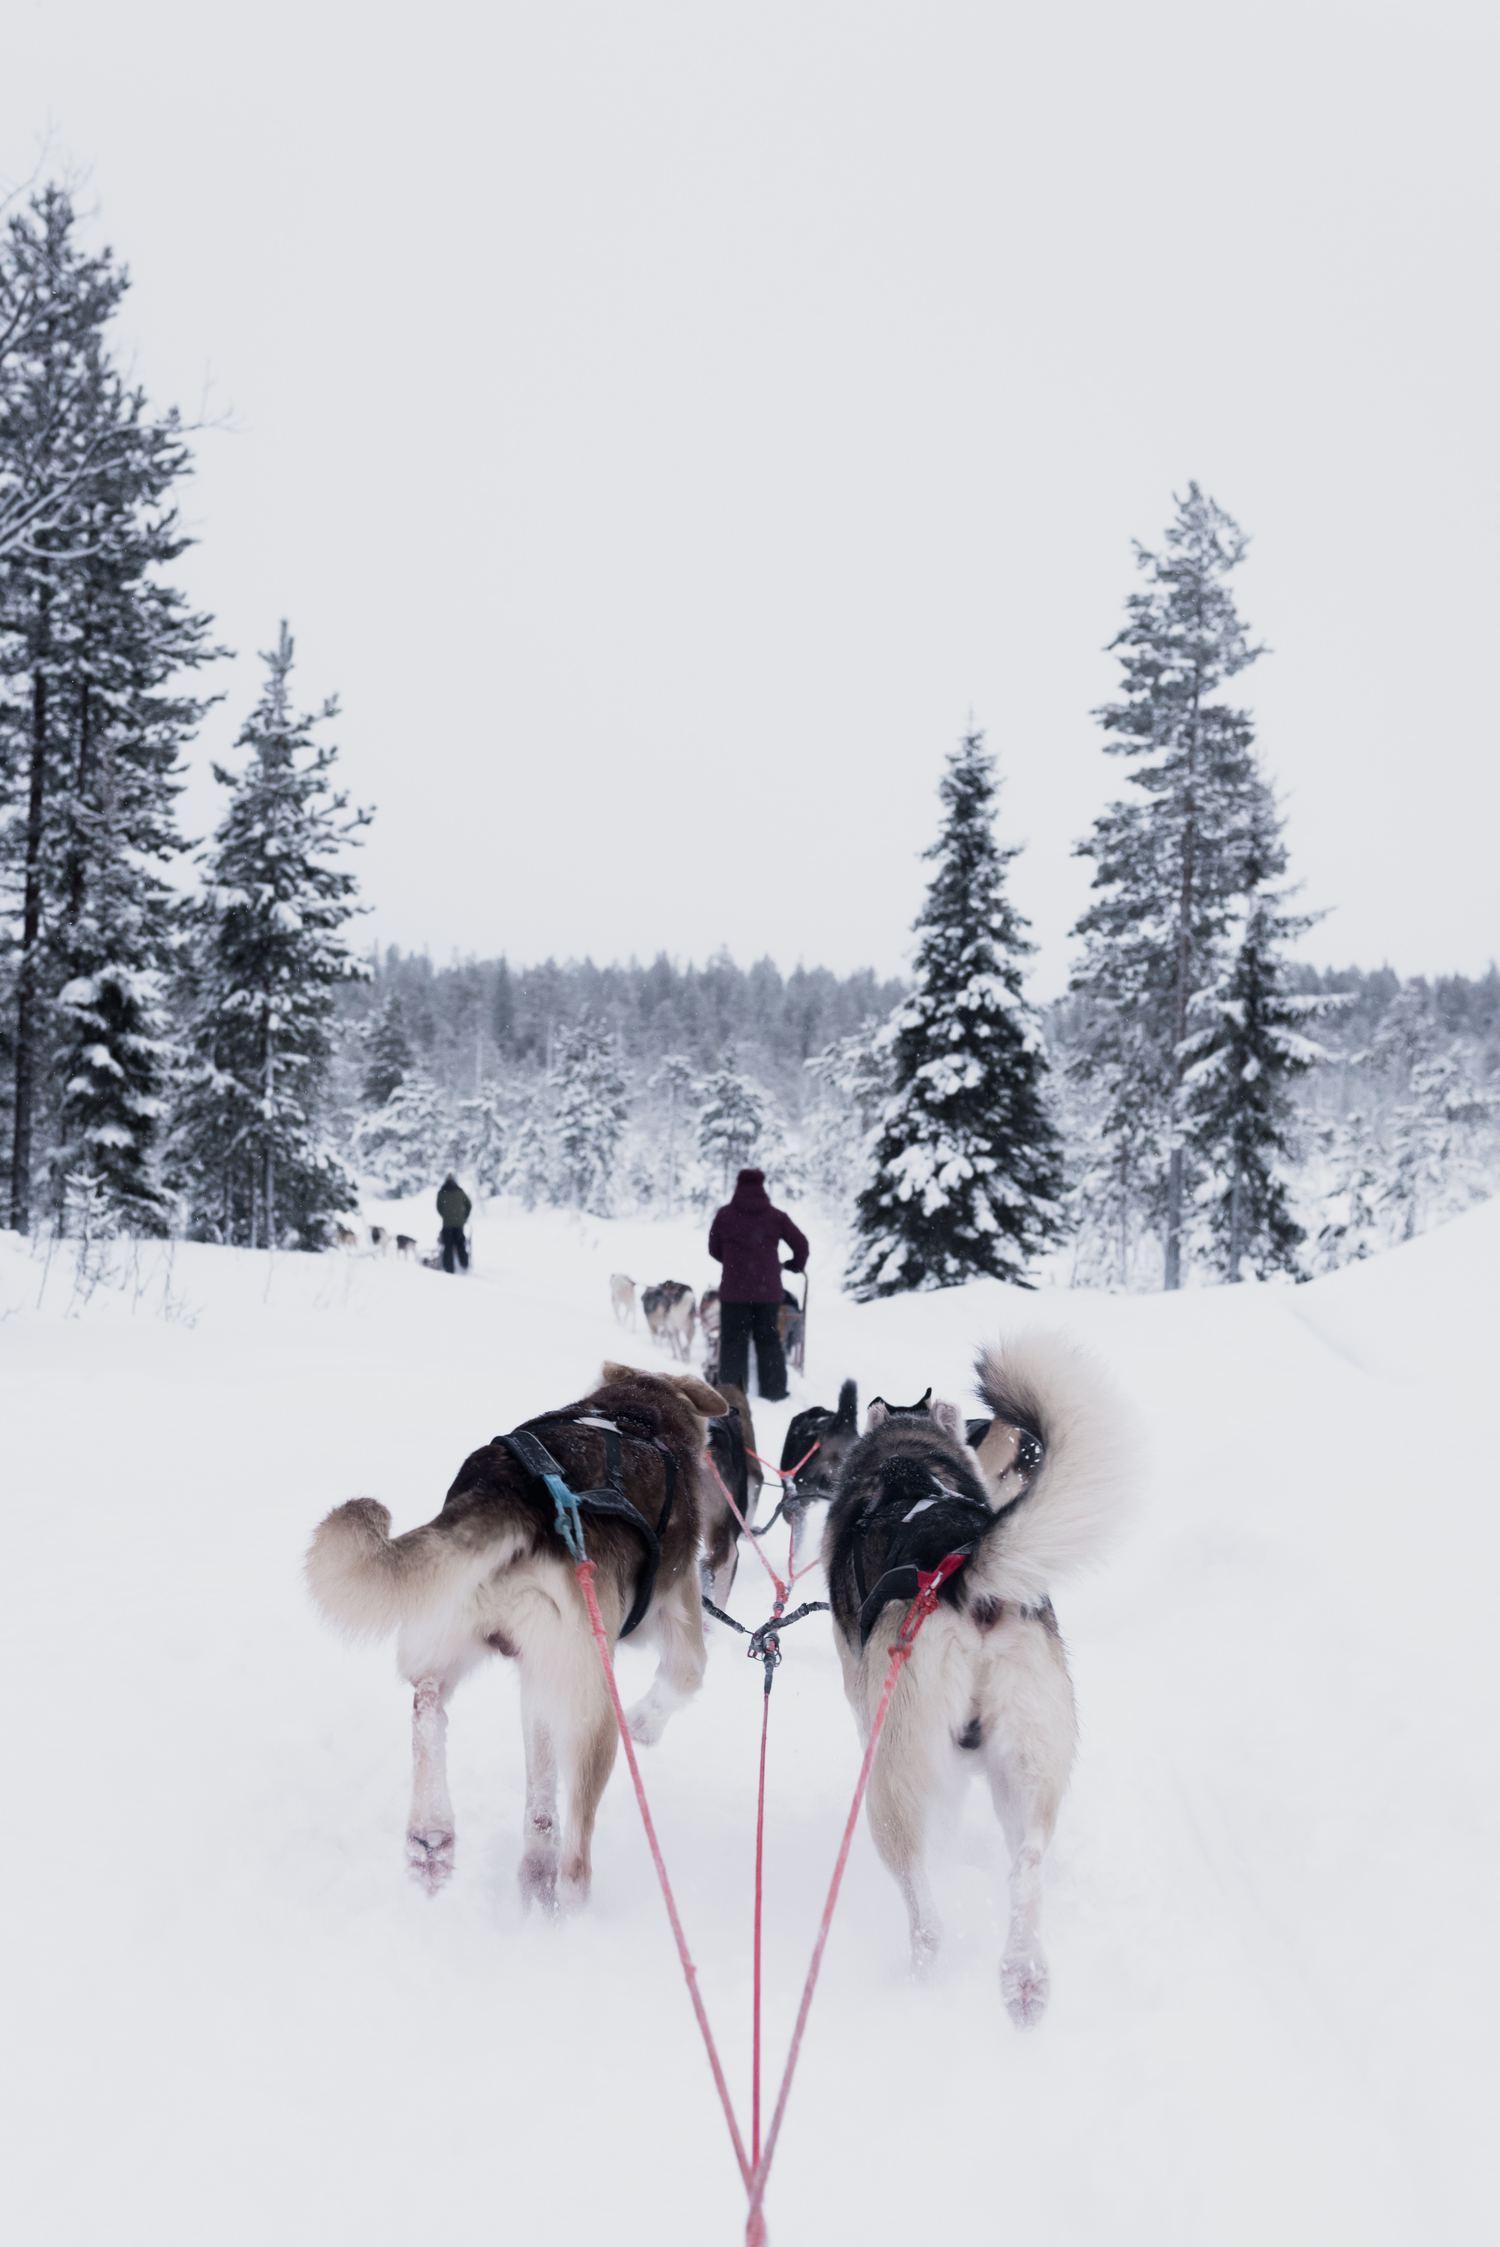 Laponia nieve y trineo